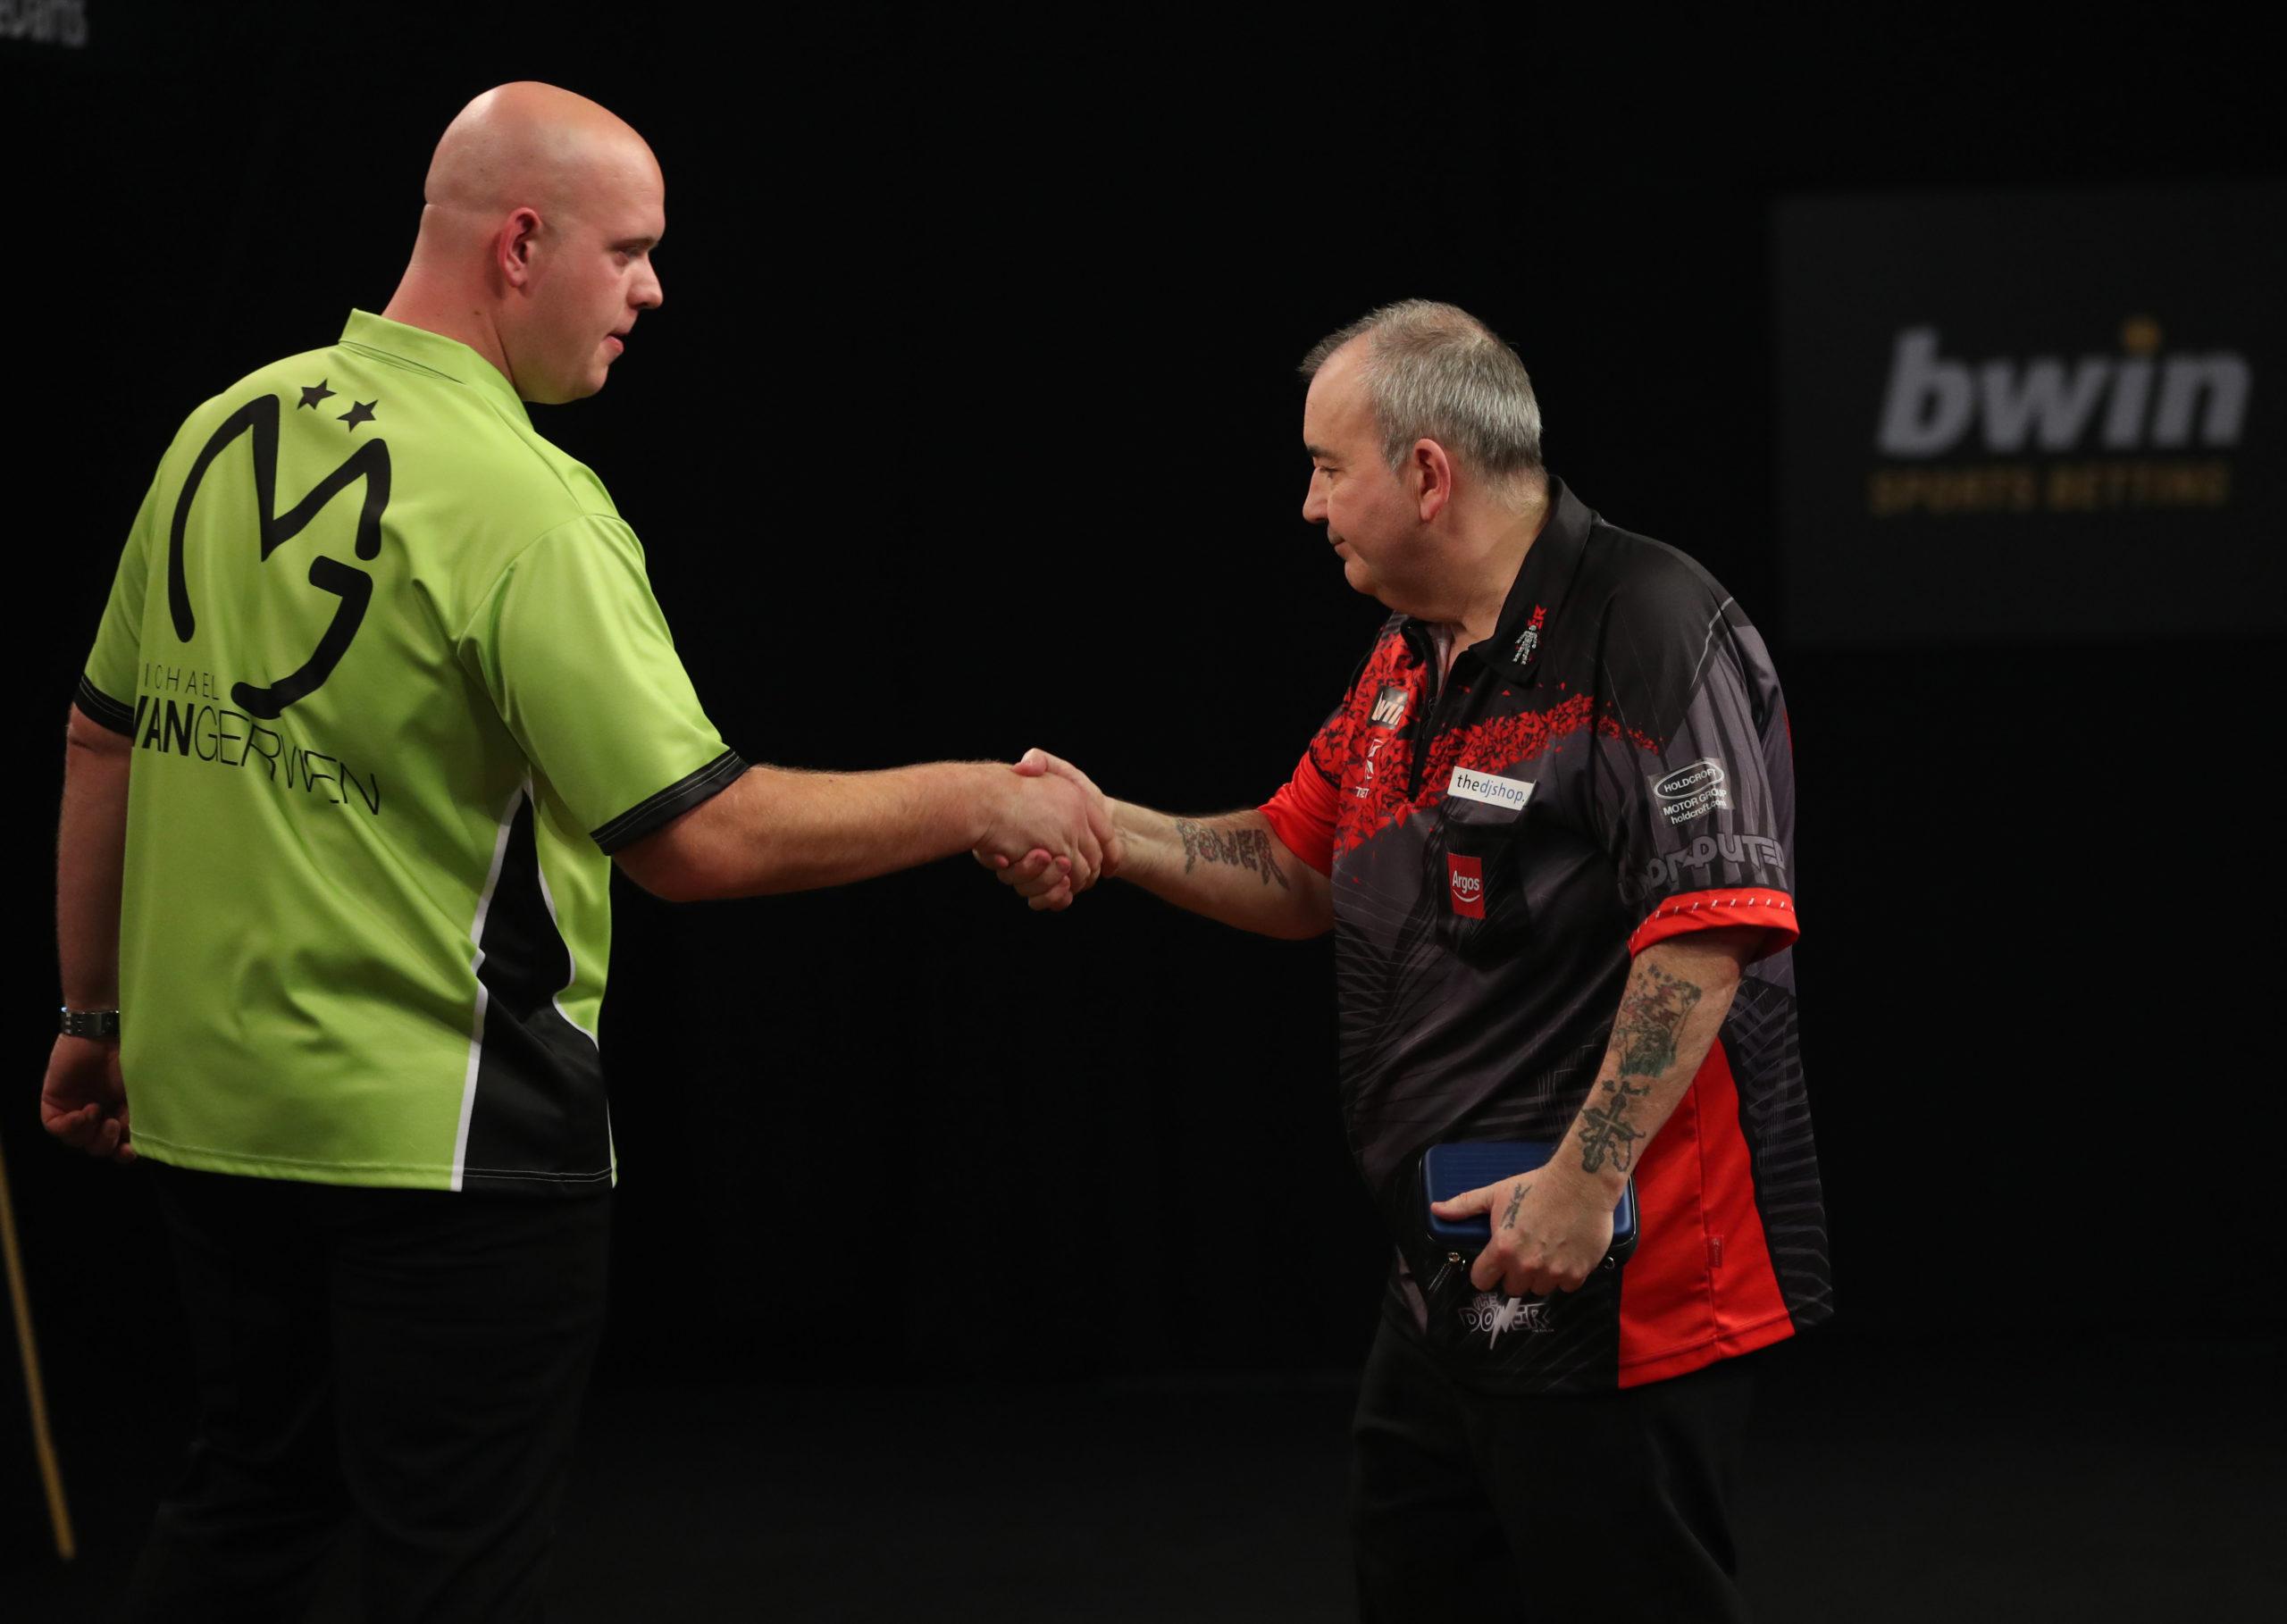 Rivalry between Michael van Gerwen and Phil Taylor rumbles on